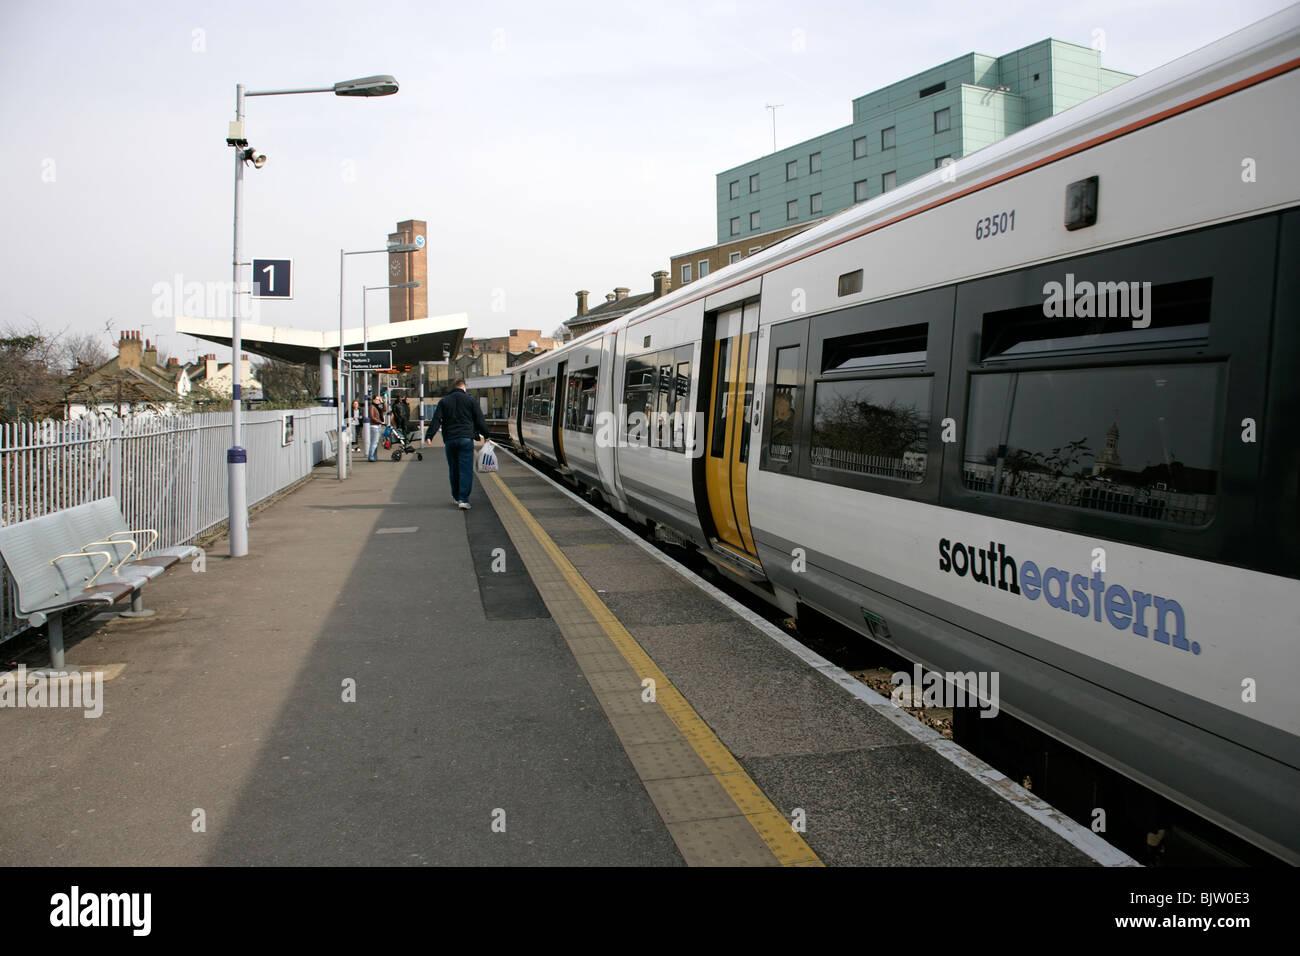 A Southeastern train at the station platform at Greenwich, London, UK - Stock Image